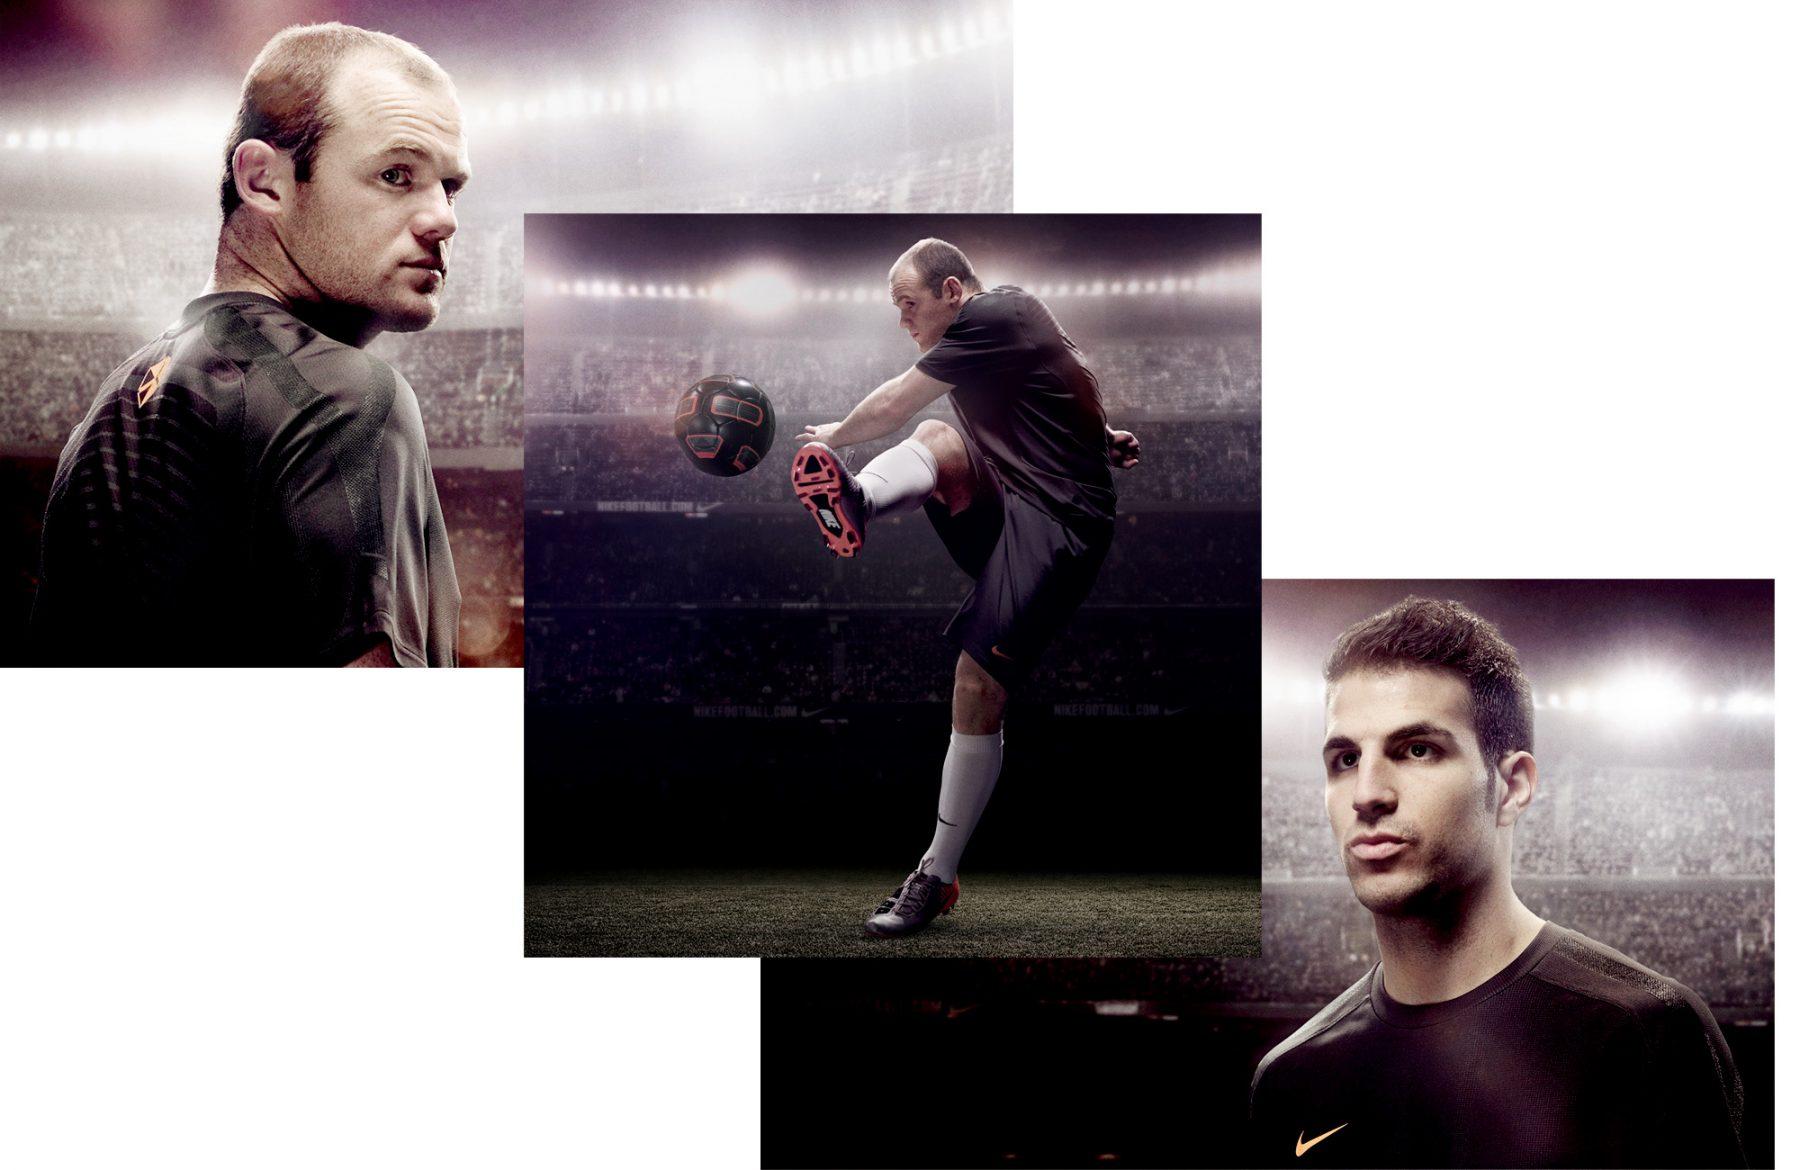 Nike Elite - 1 of 3